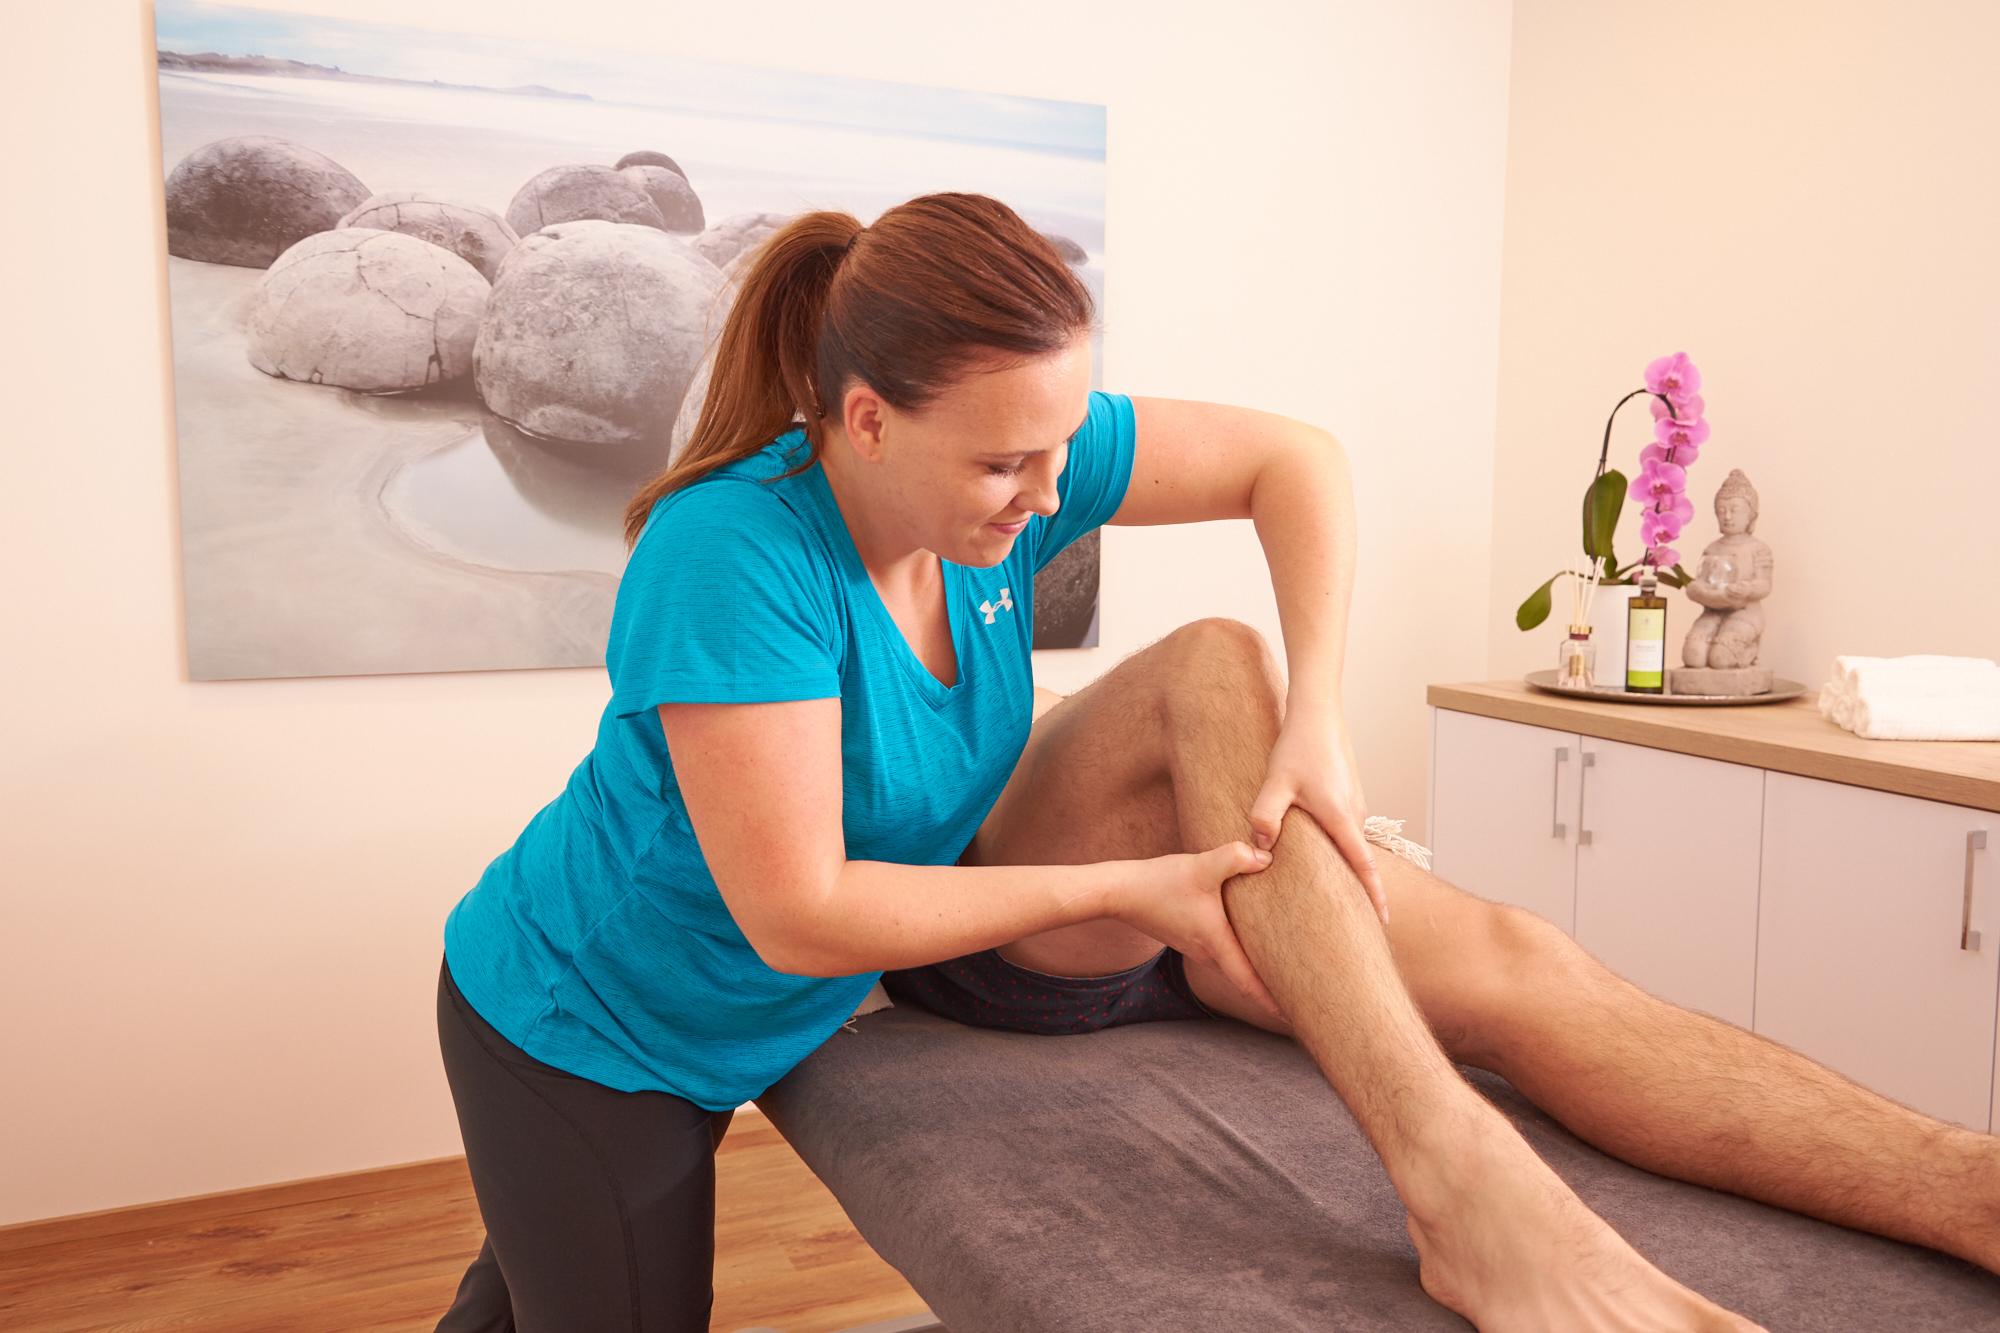 Physiotherapie Salzburg Umgebung - Physiotherapeutin Verena Riedl bei der Arbeit